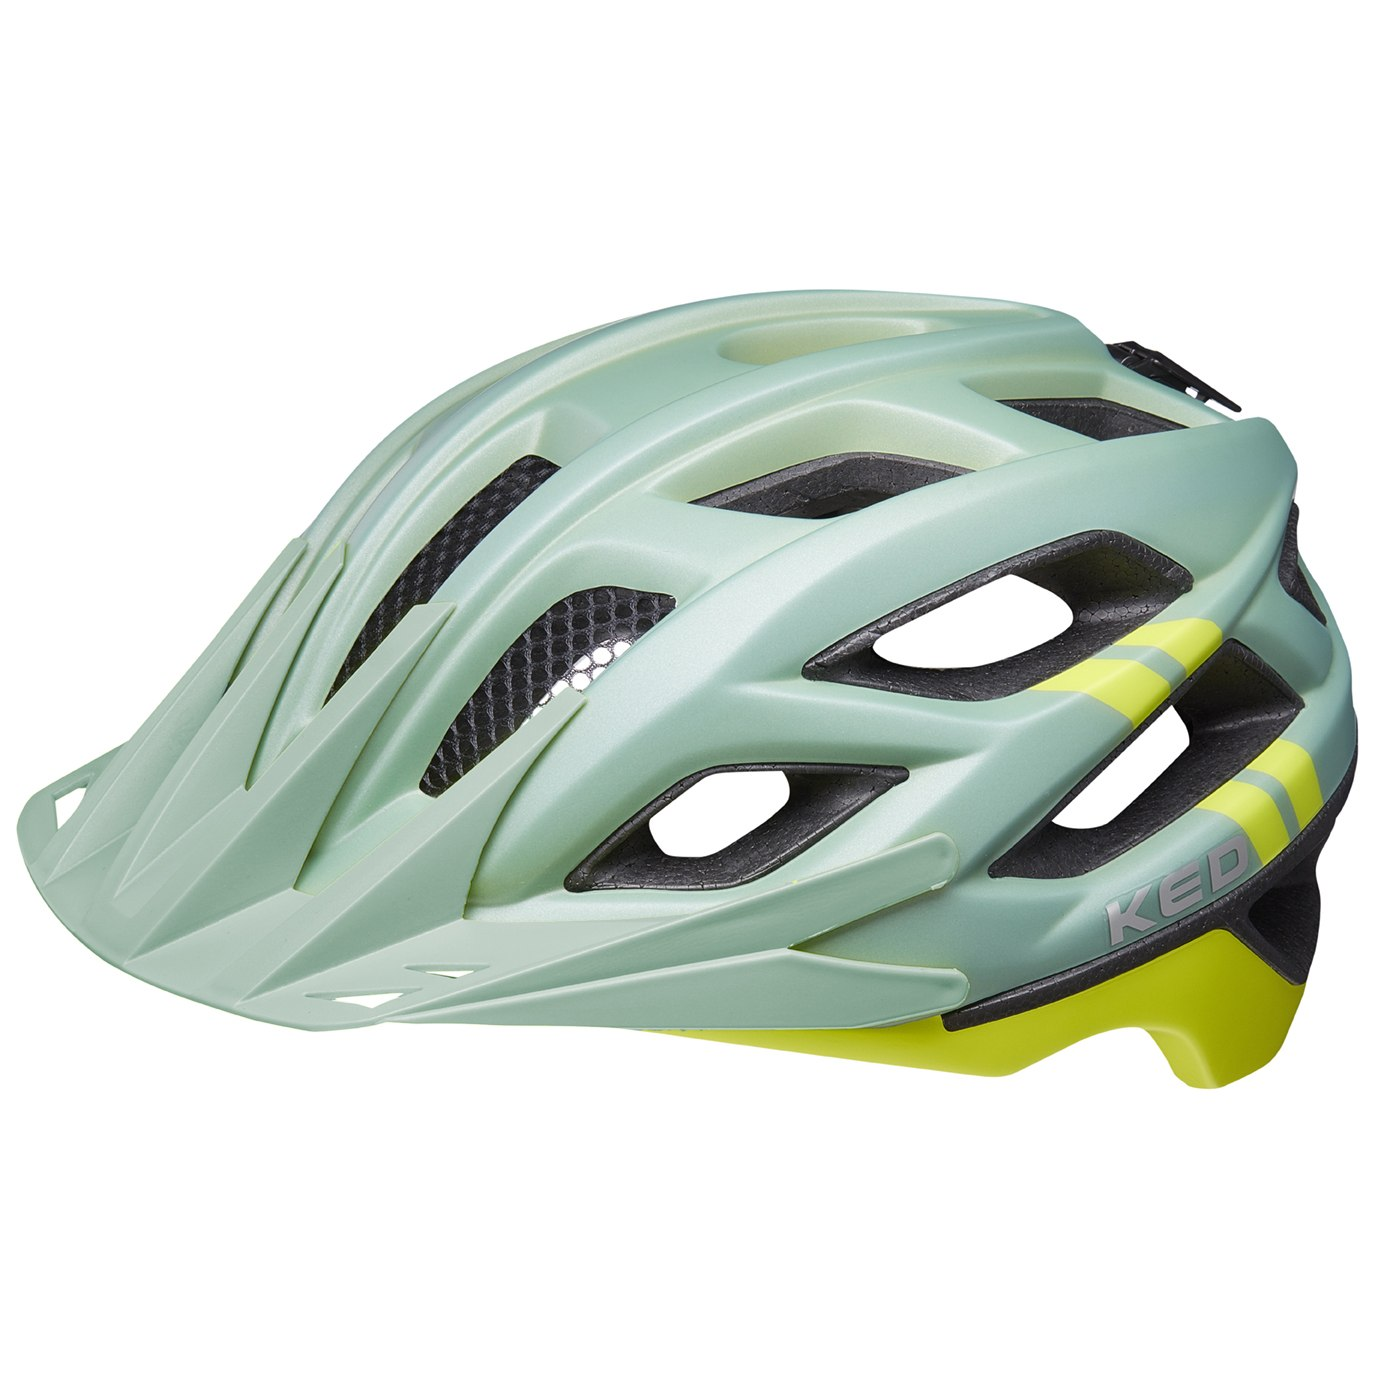 KED Companion Helm - olive yellow matt